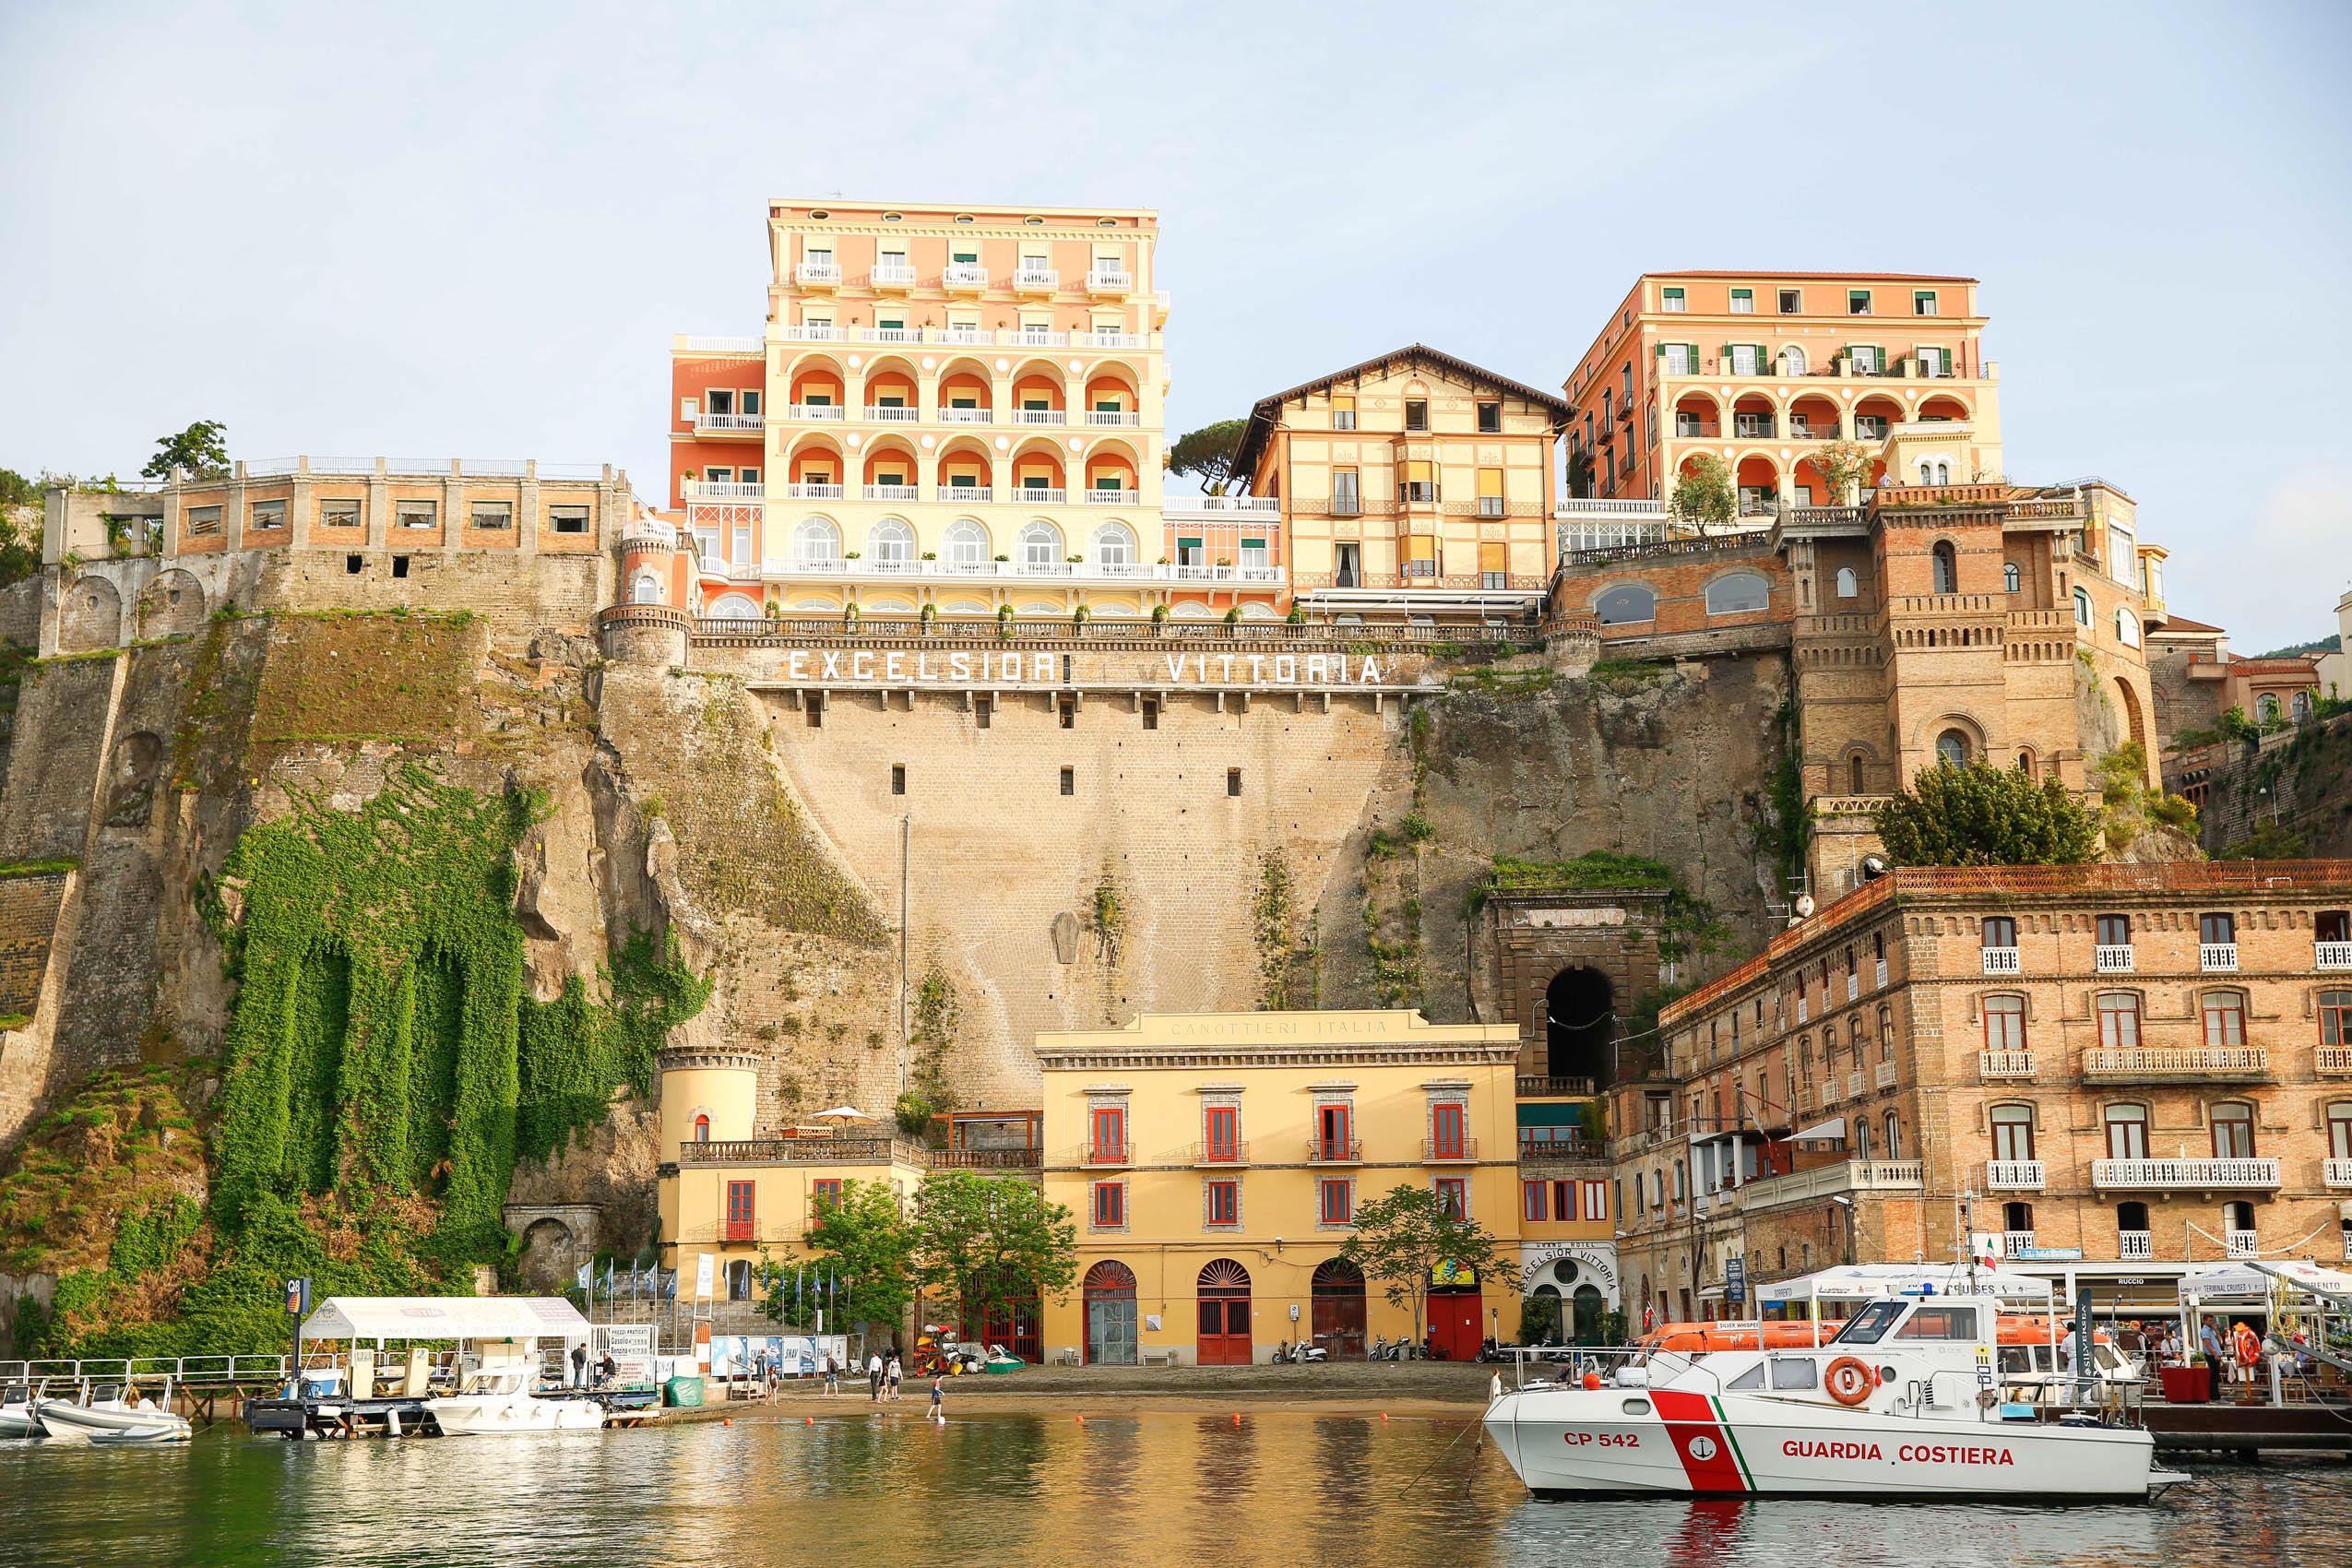 amalfi coast travel guide sorento italy